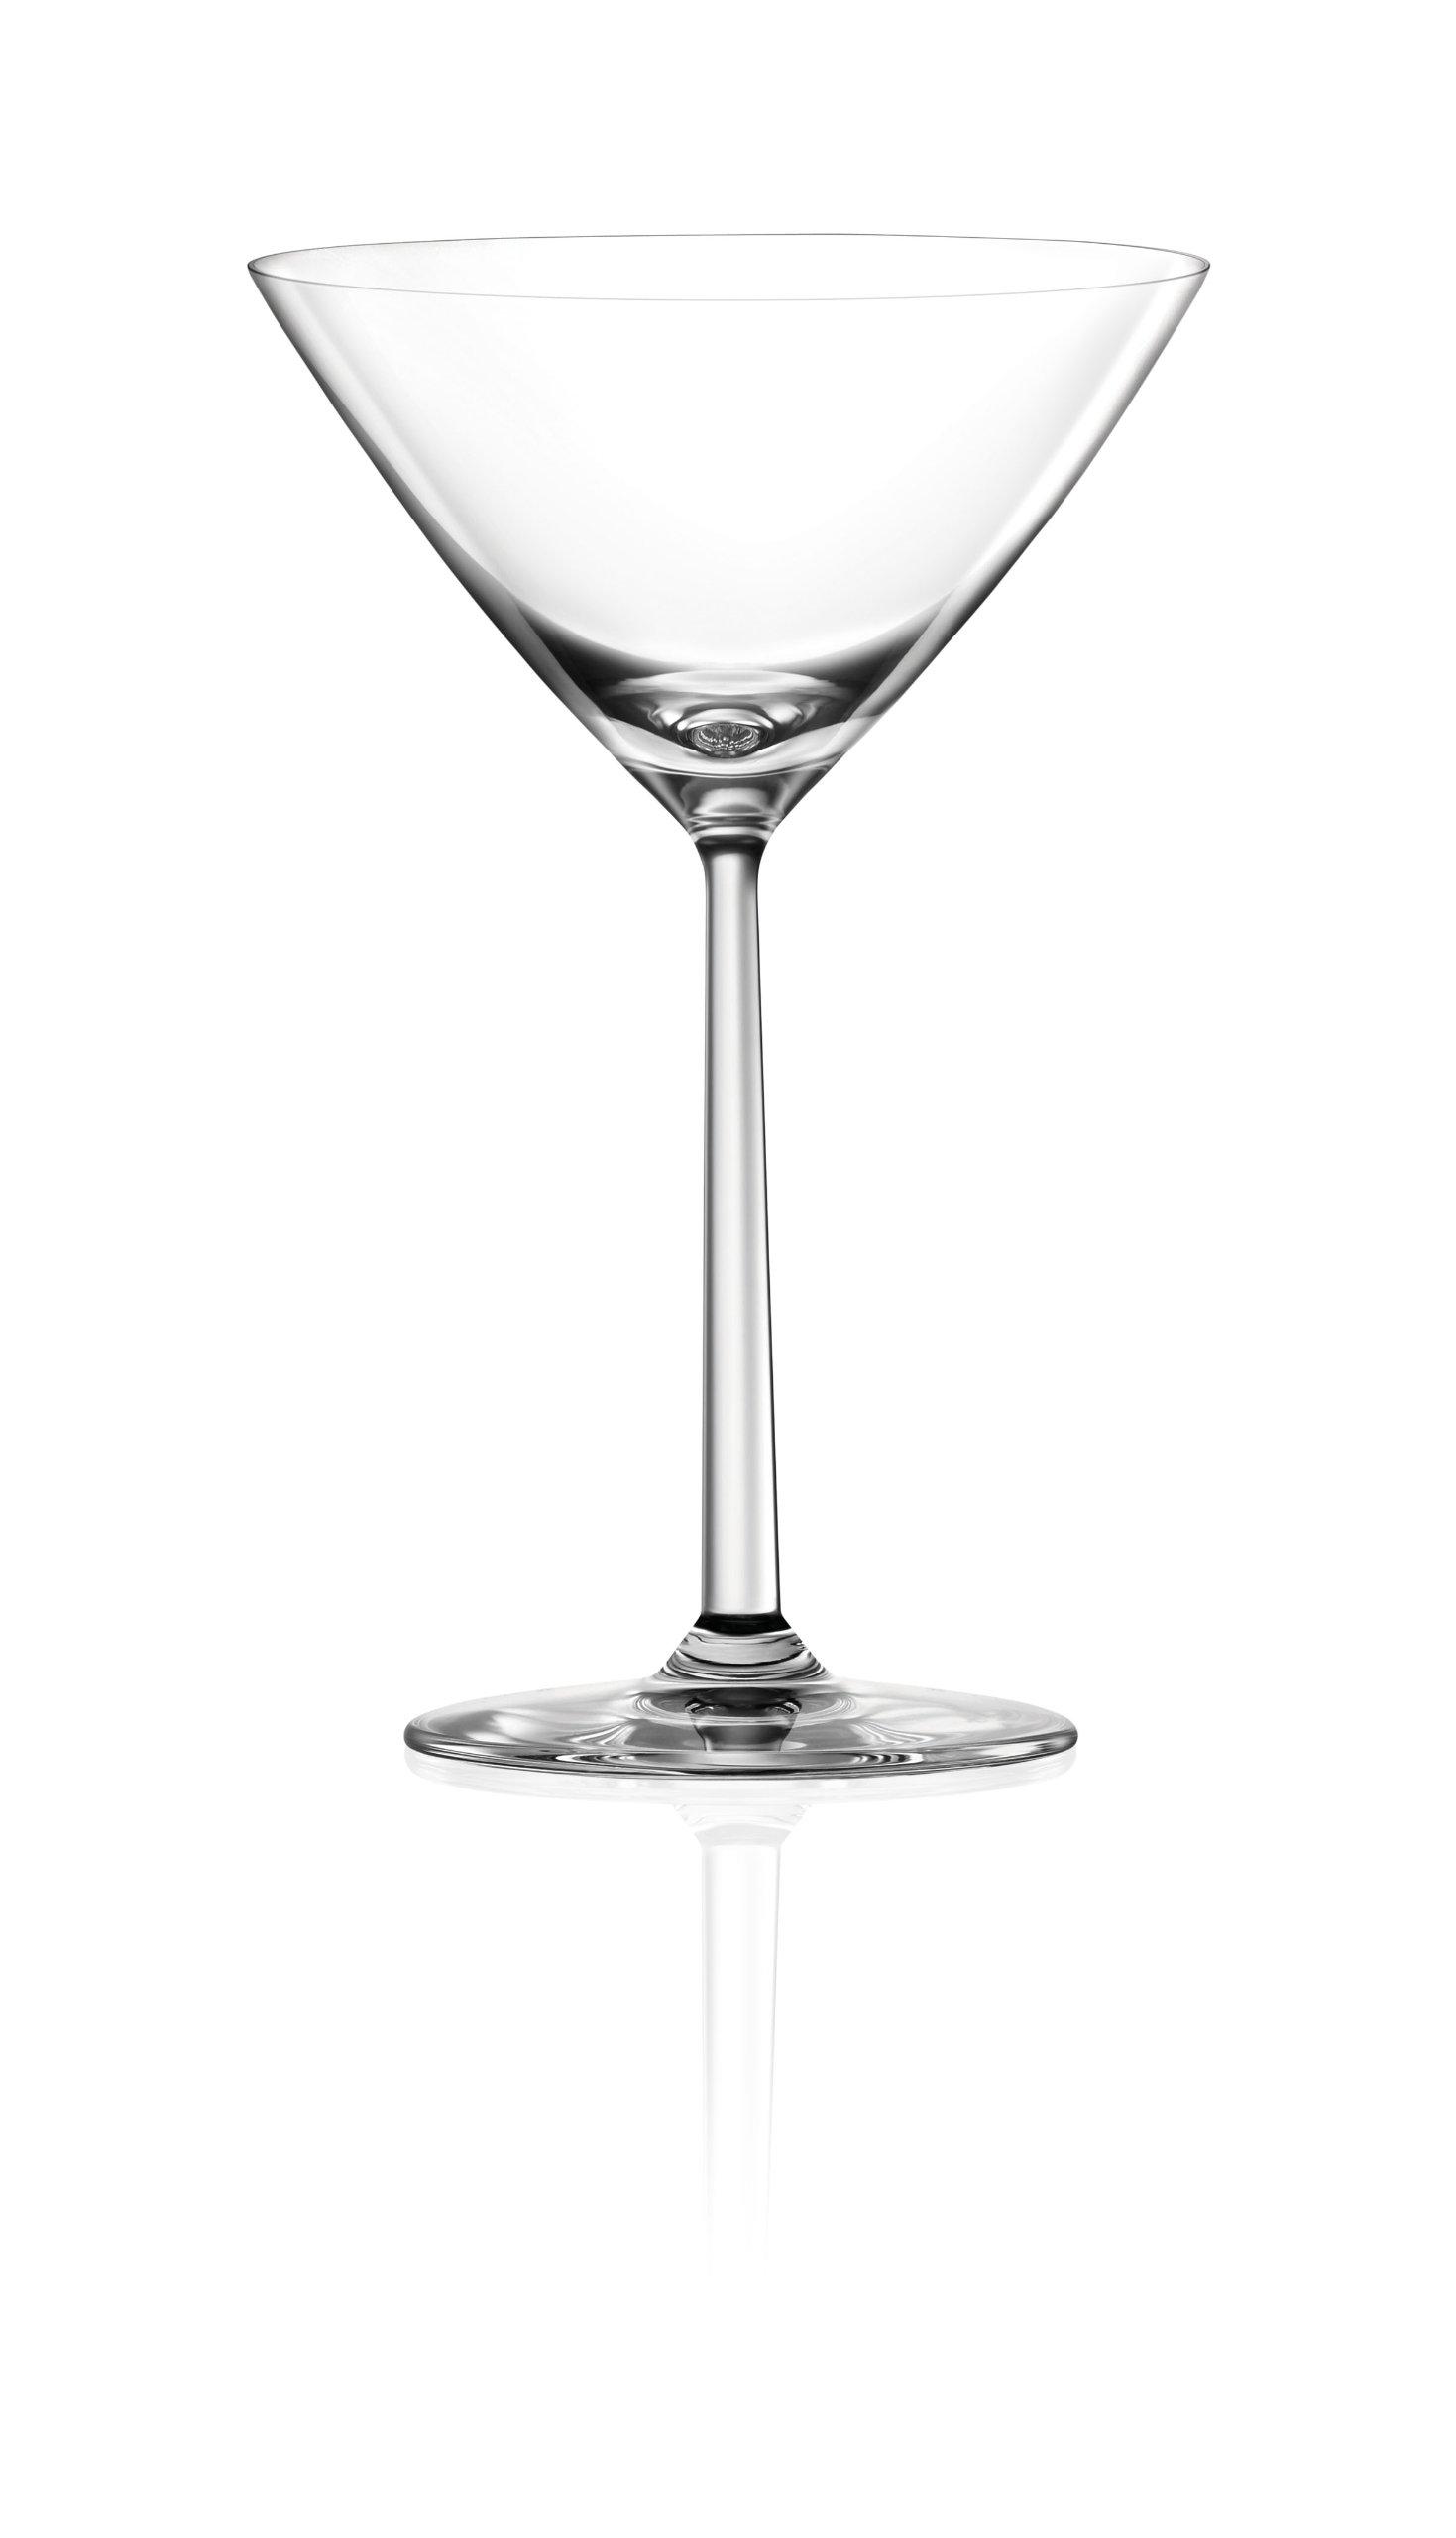 Lucaris Shanghai Soul Martini Glass, 7.8-Ounce, Set of 4 by Lucaris